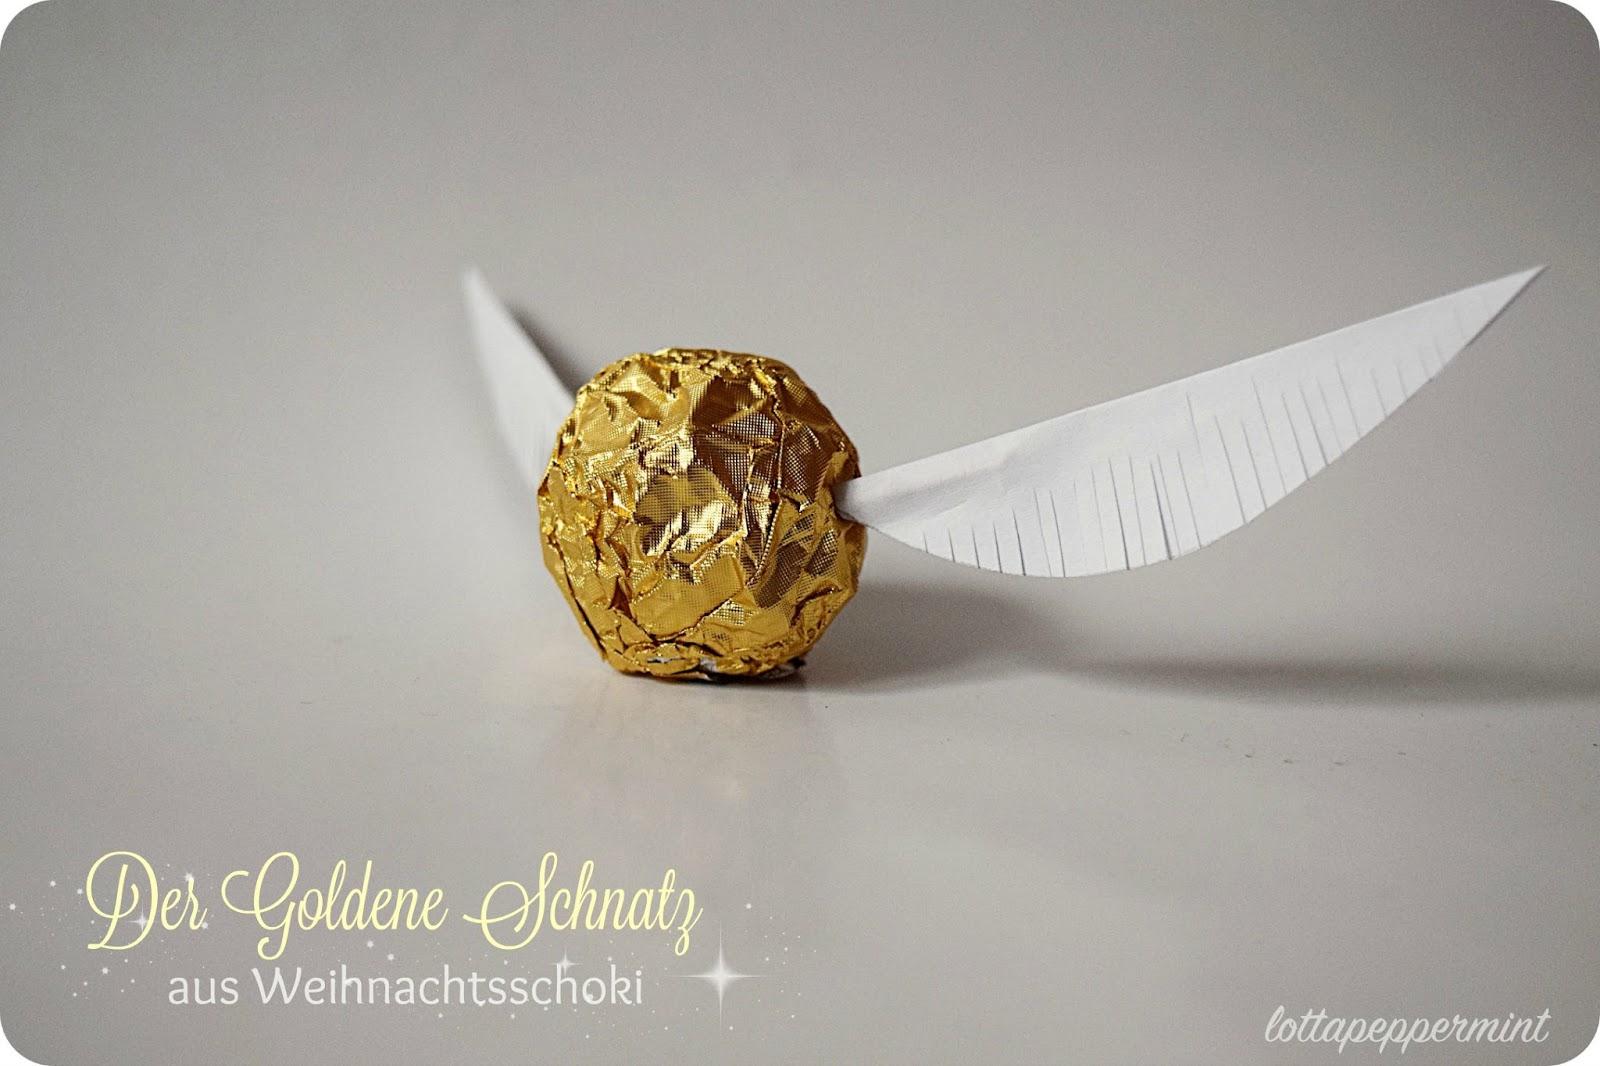 goldener schnatz basteln | dansenfeesten